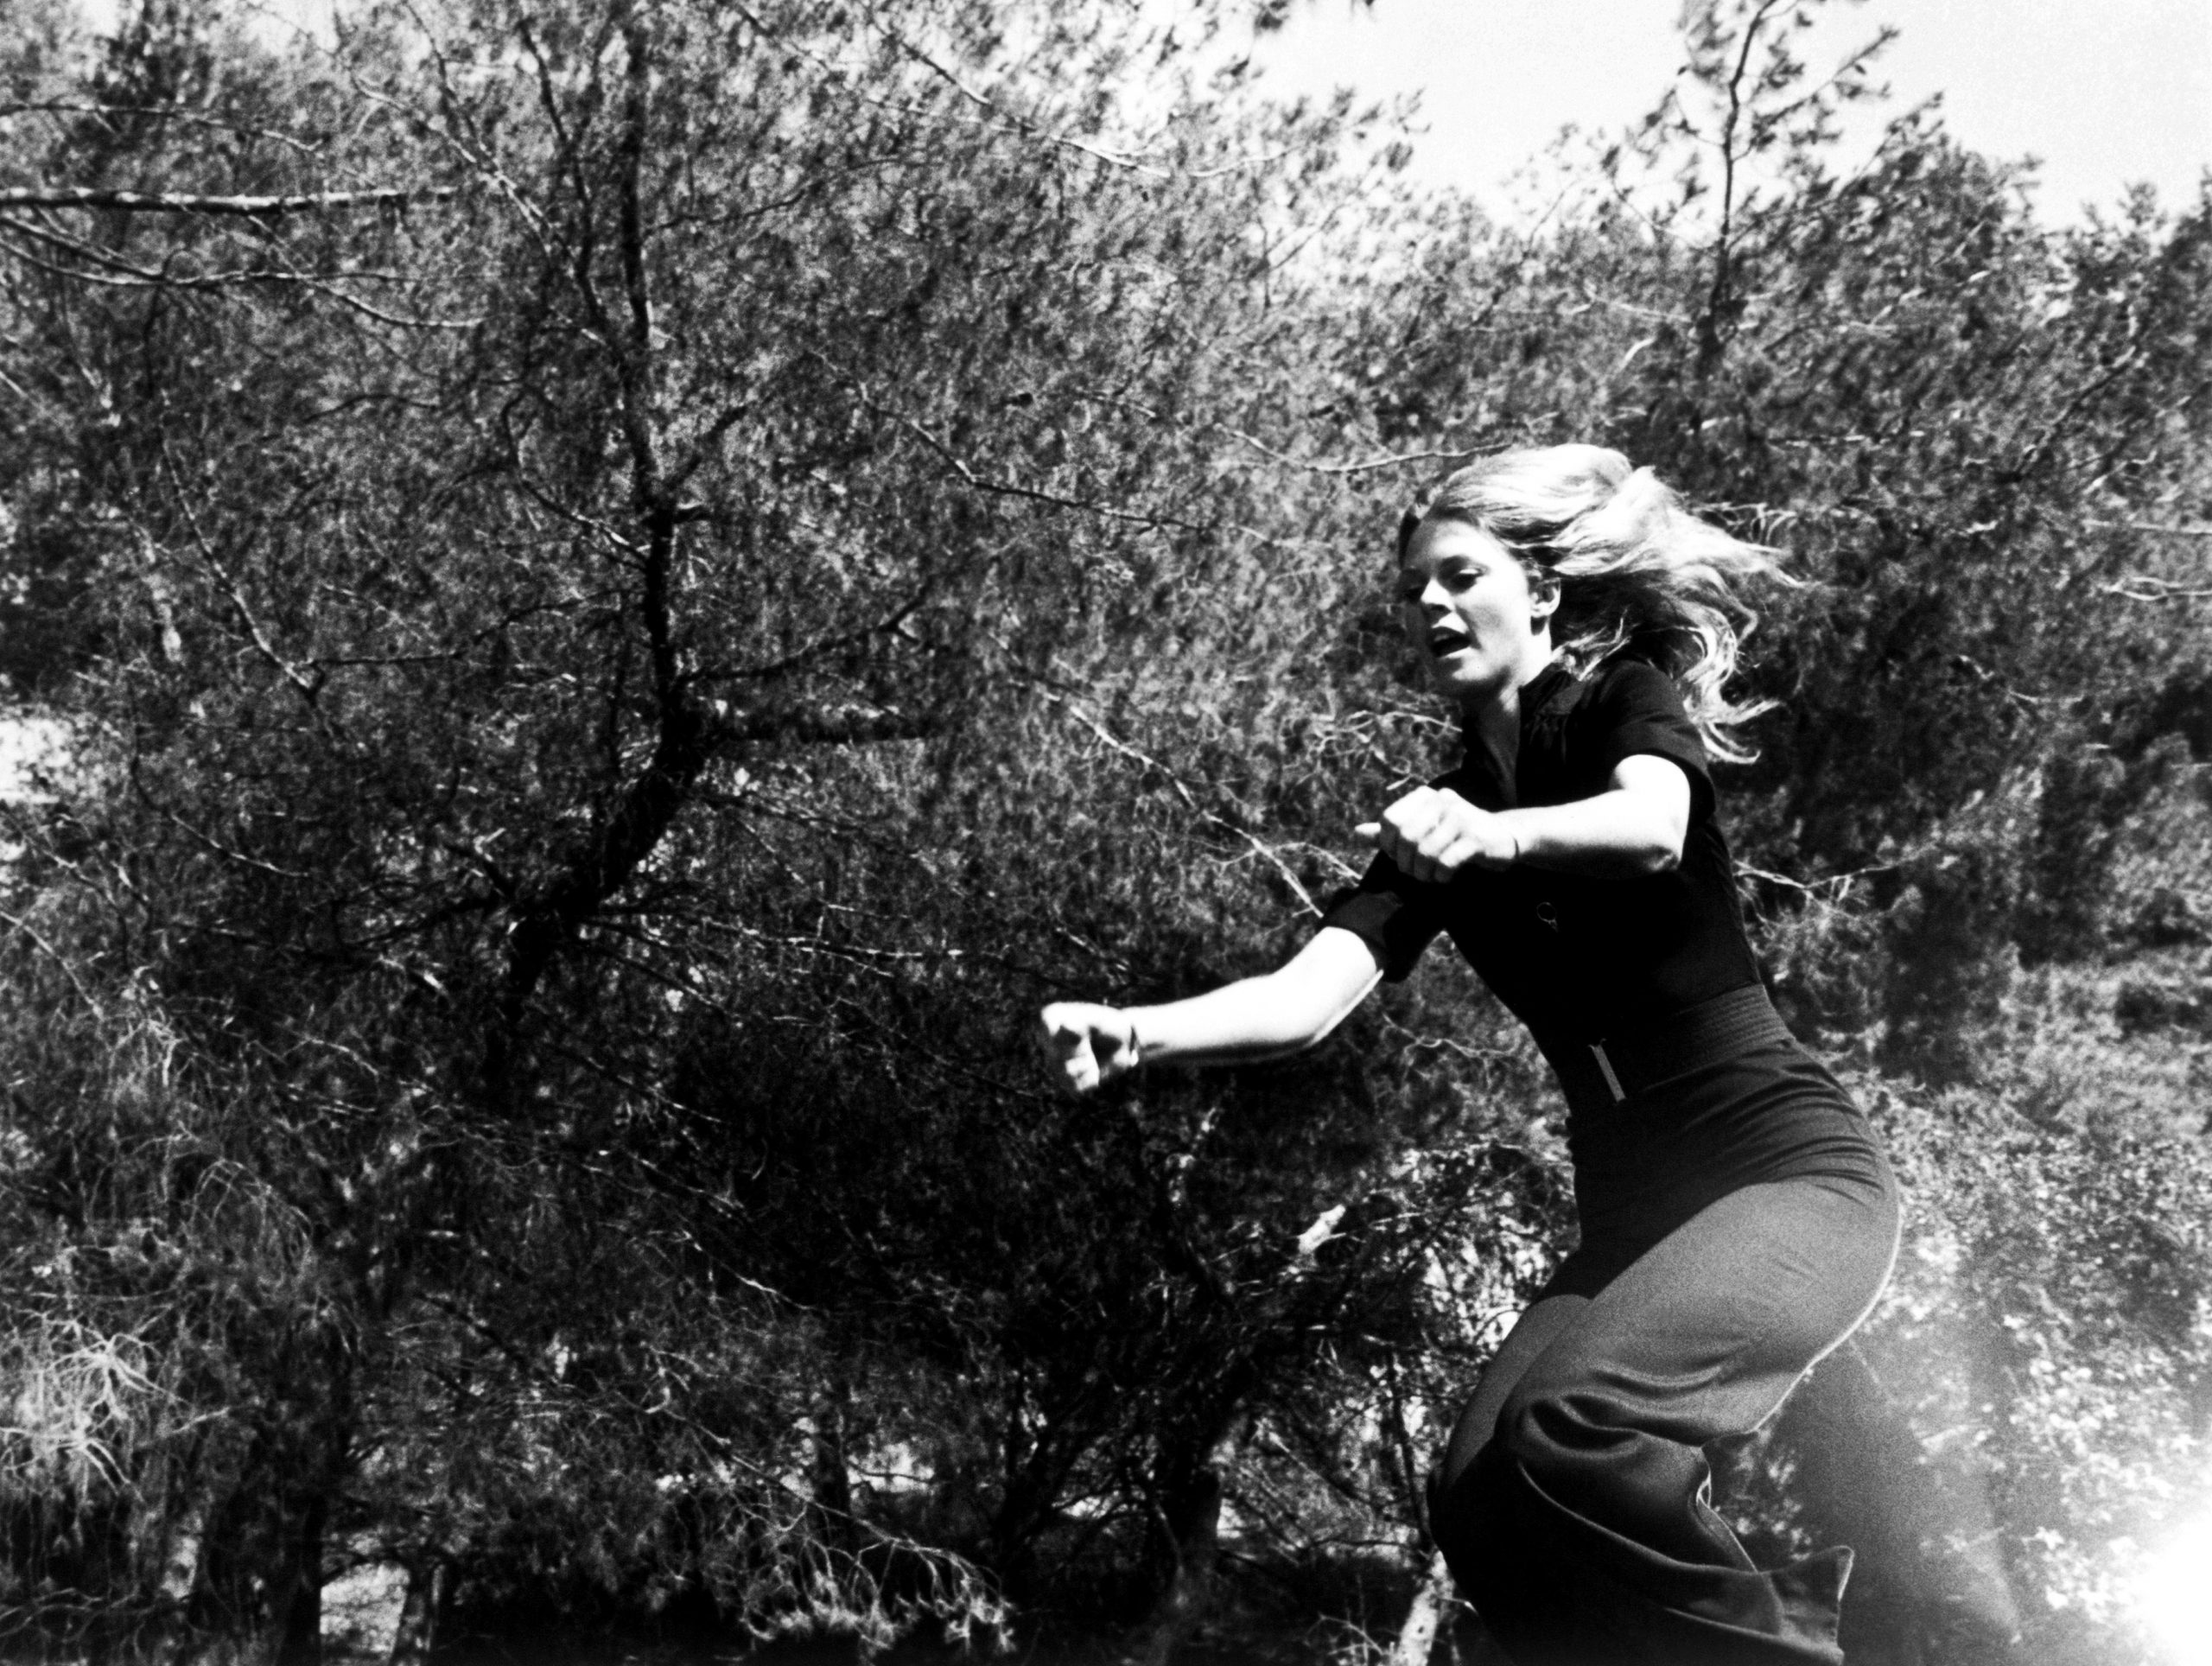 lindsay-wagner-the-bionic-woman